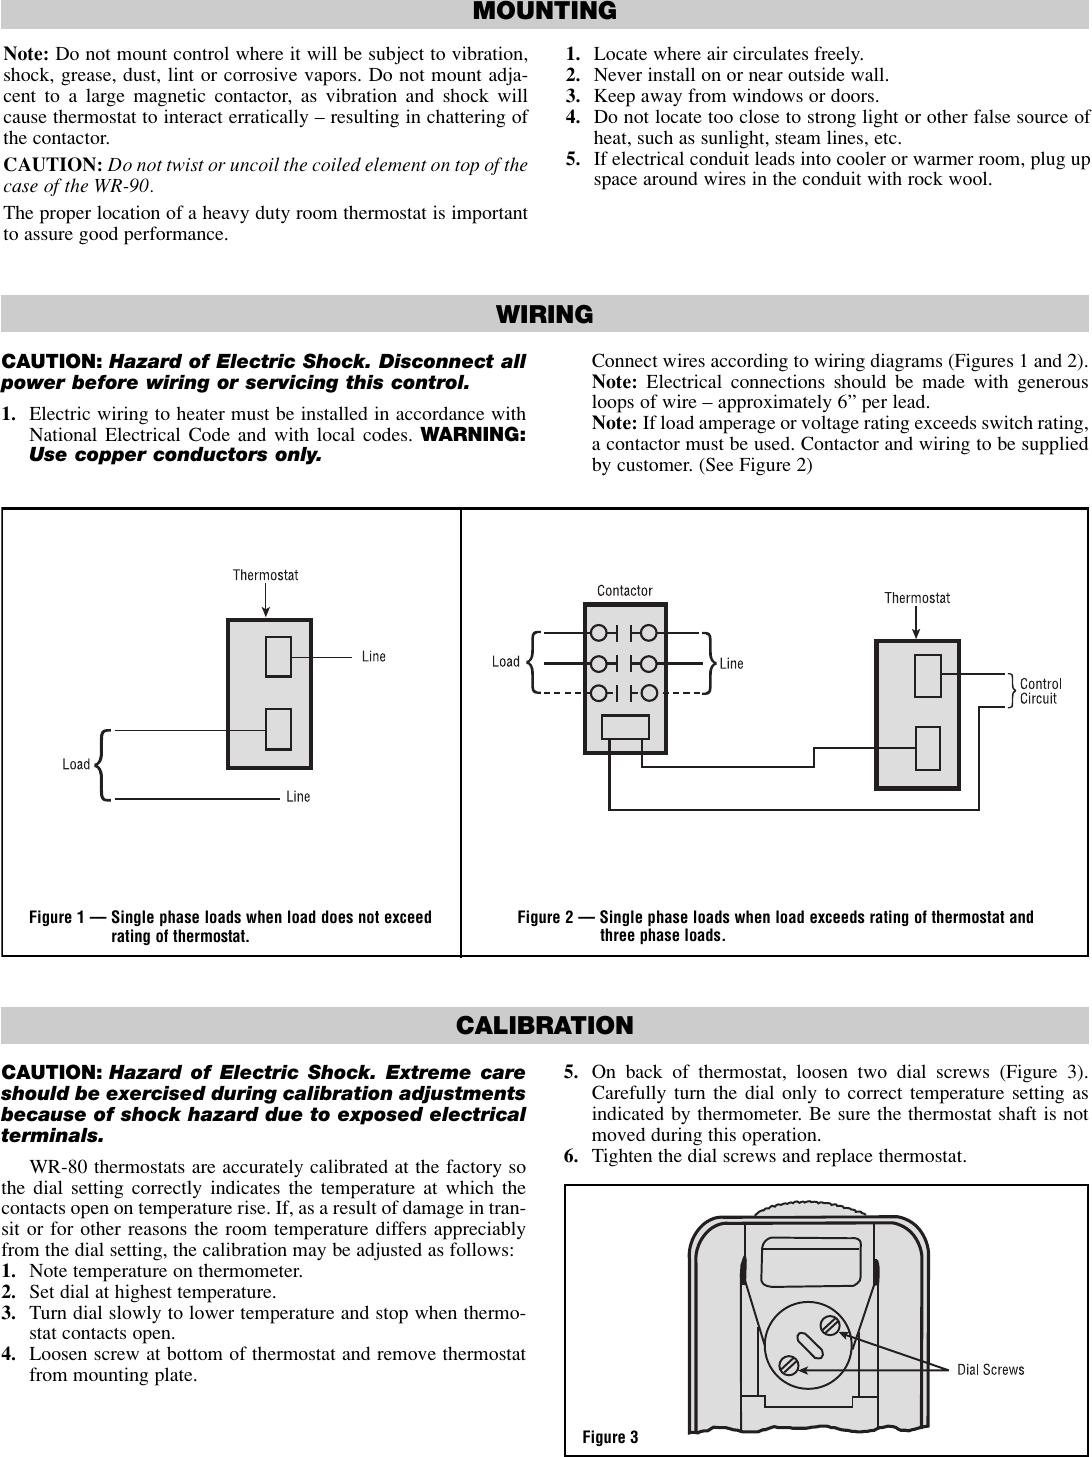 Chromalox Pk410 1 Users Manual Chx Wiring Diagrams Page 2 Of 4